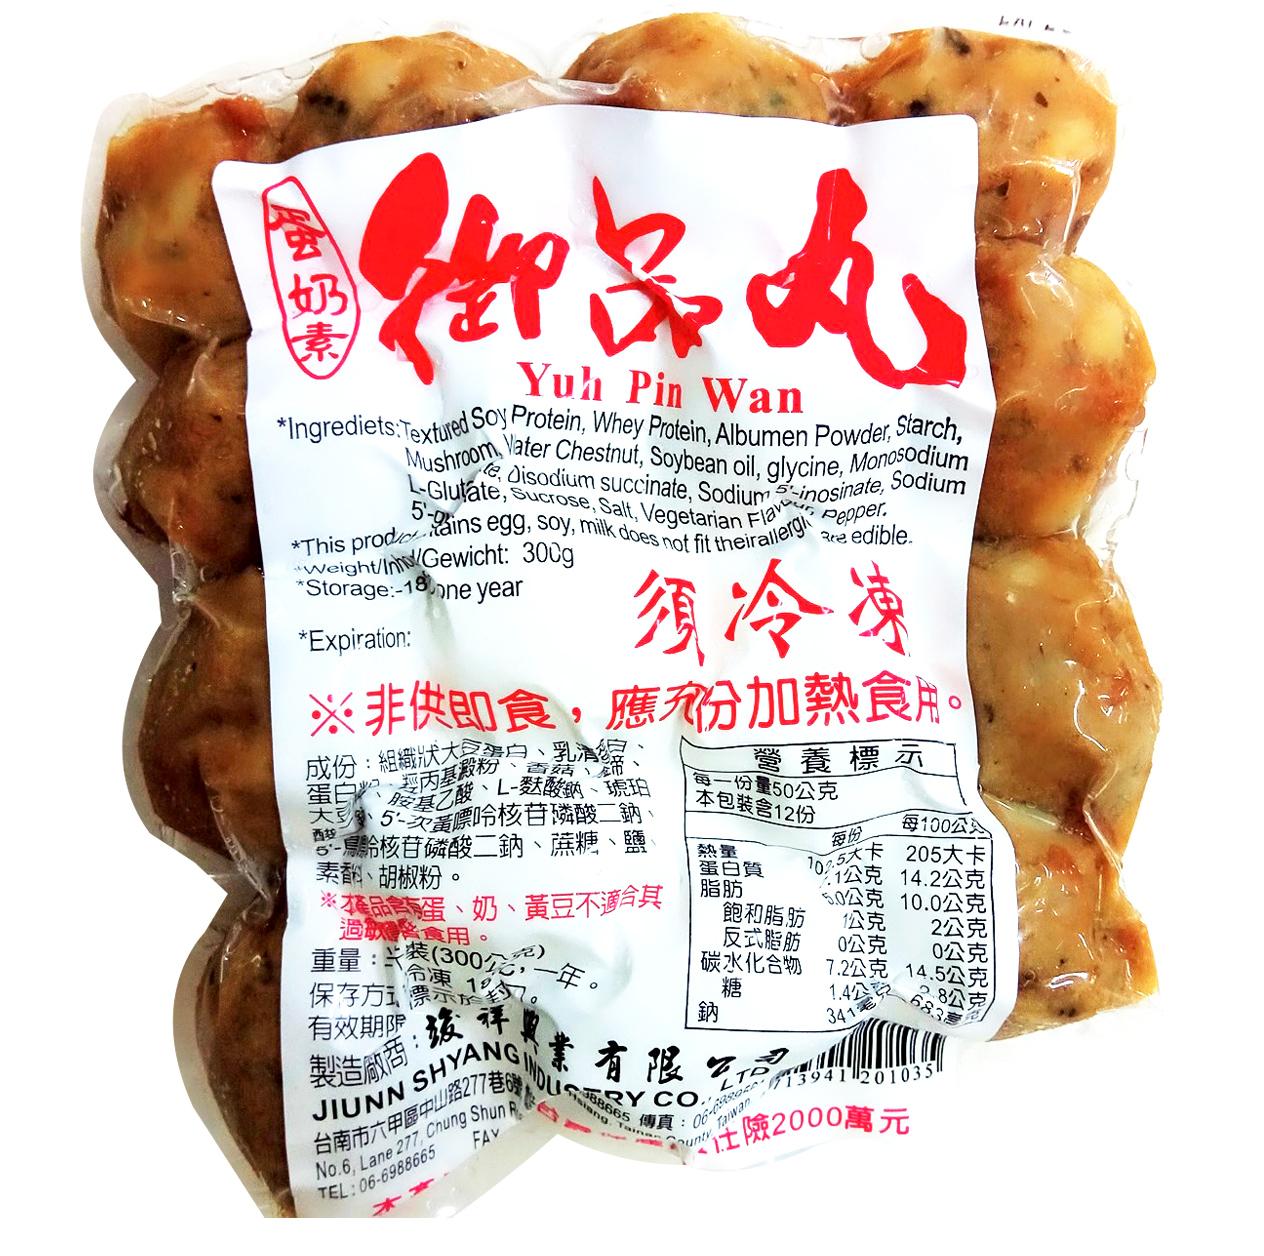 Image Yuh Pin Wan 善缘 - 御品丸 300grams